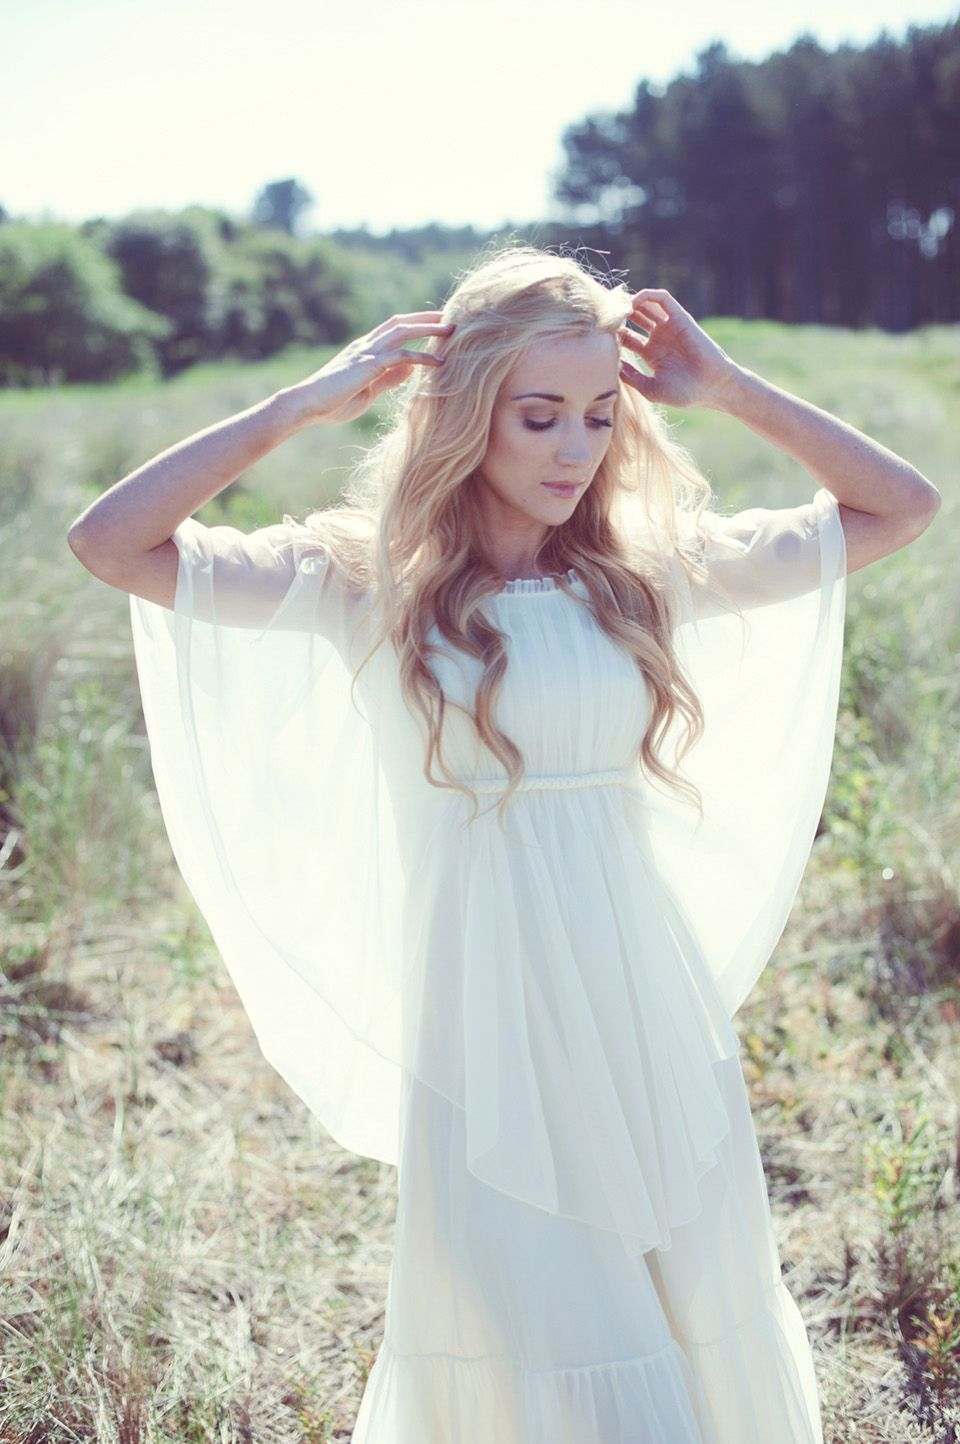 Beautiful natural ecofriendly and bohemian bridal style shot on